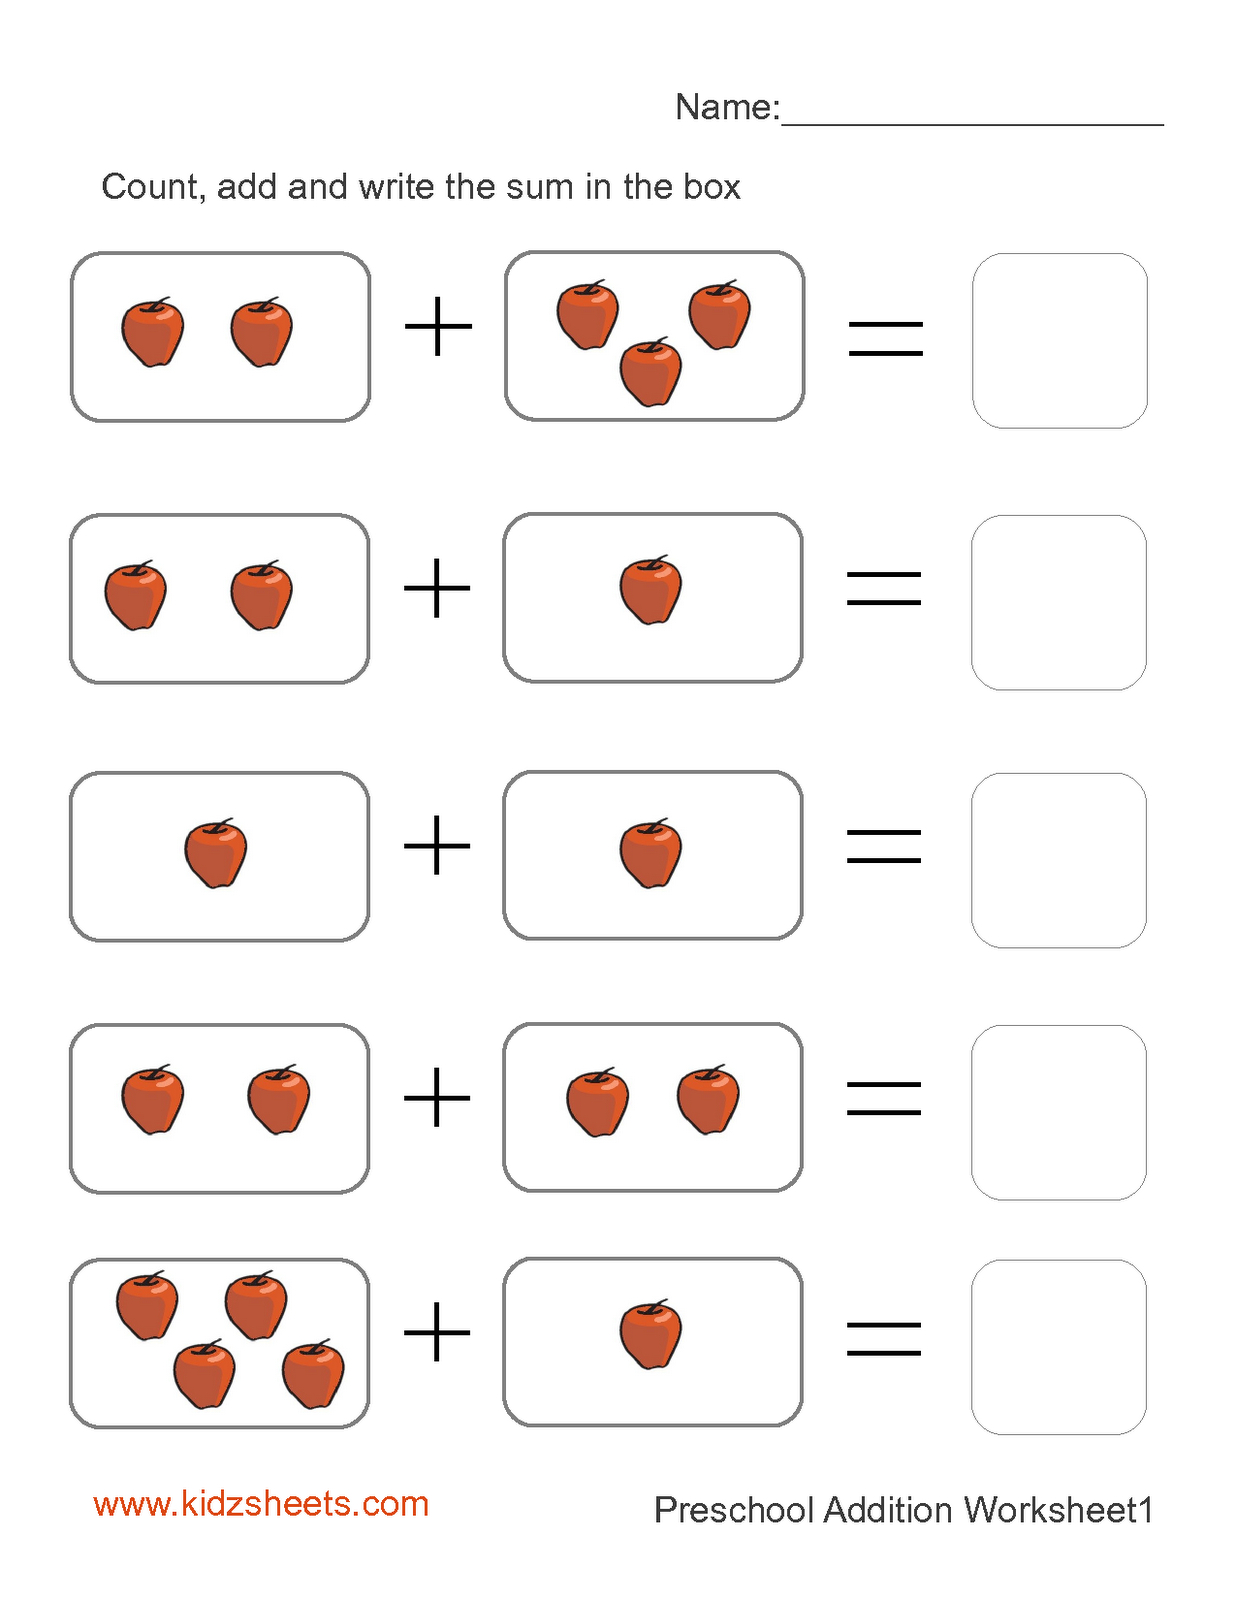 Kidz Worksheets: Preschool Addition Worksheet1 - Free Printable Preschool Addition Worksheets